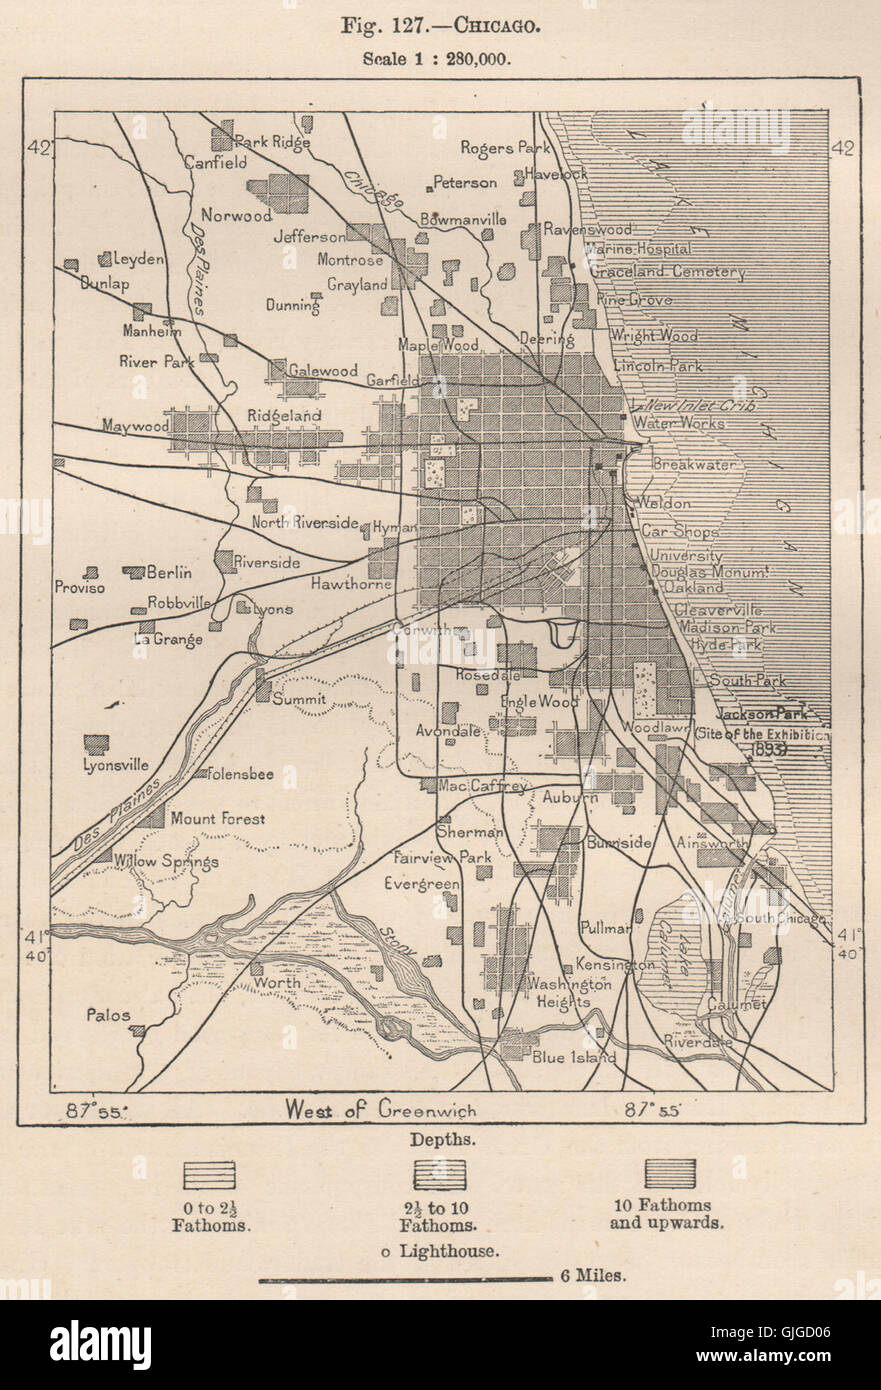 Chicago. Illinois, 1885 antique map Stock Photo: 114687446 - Alamy